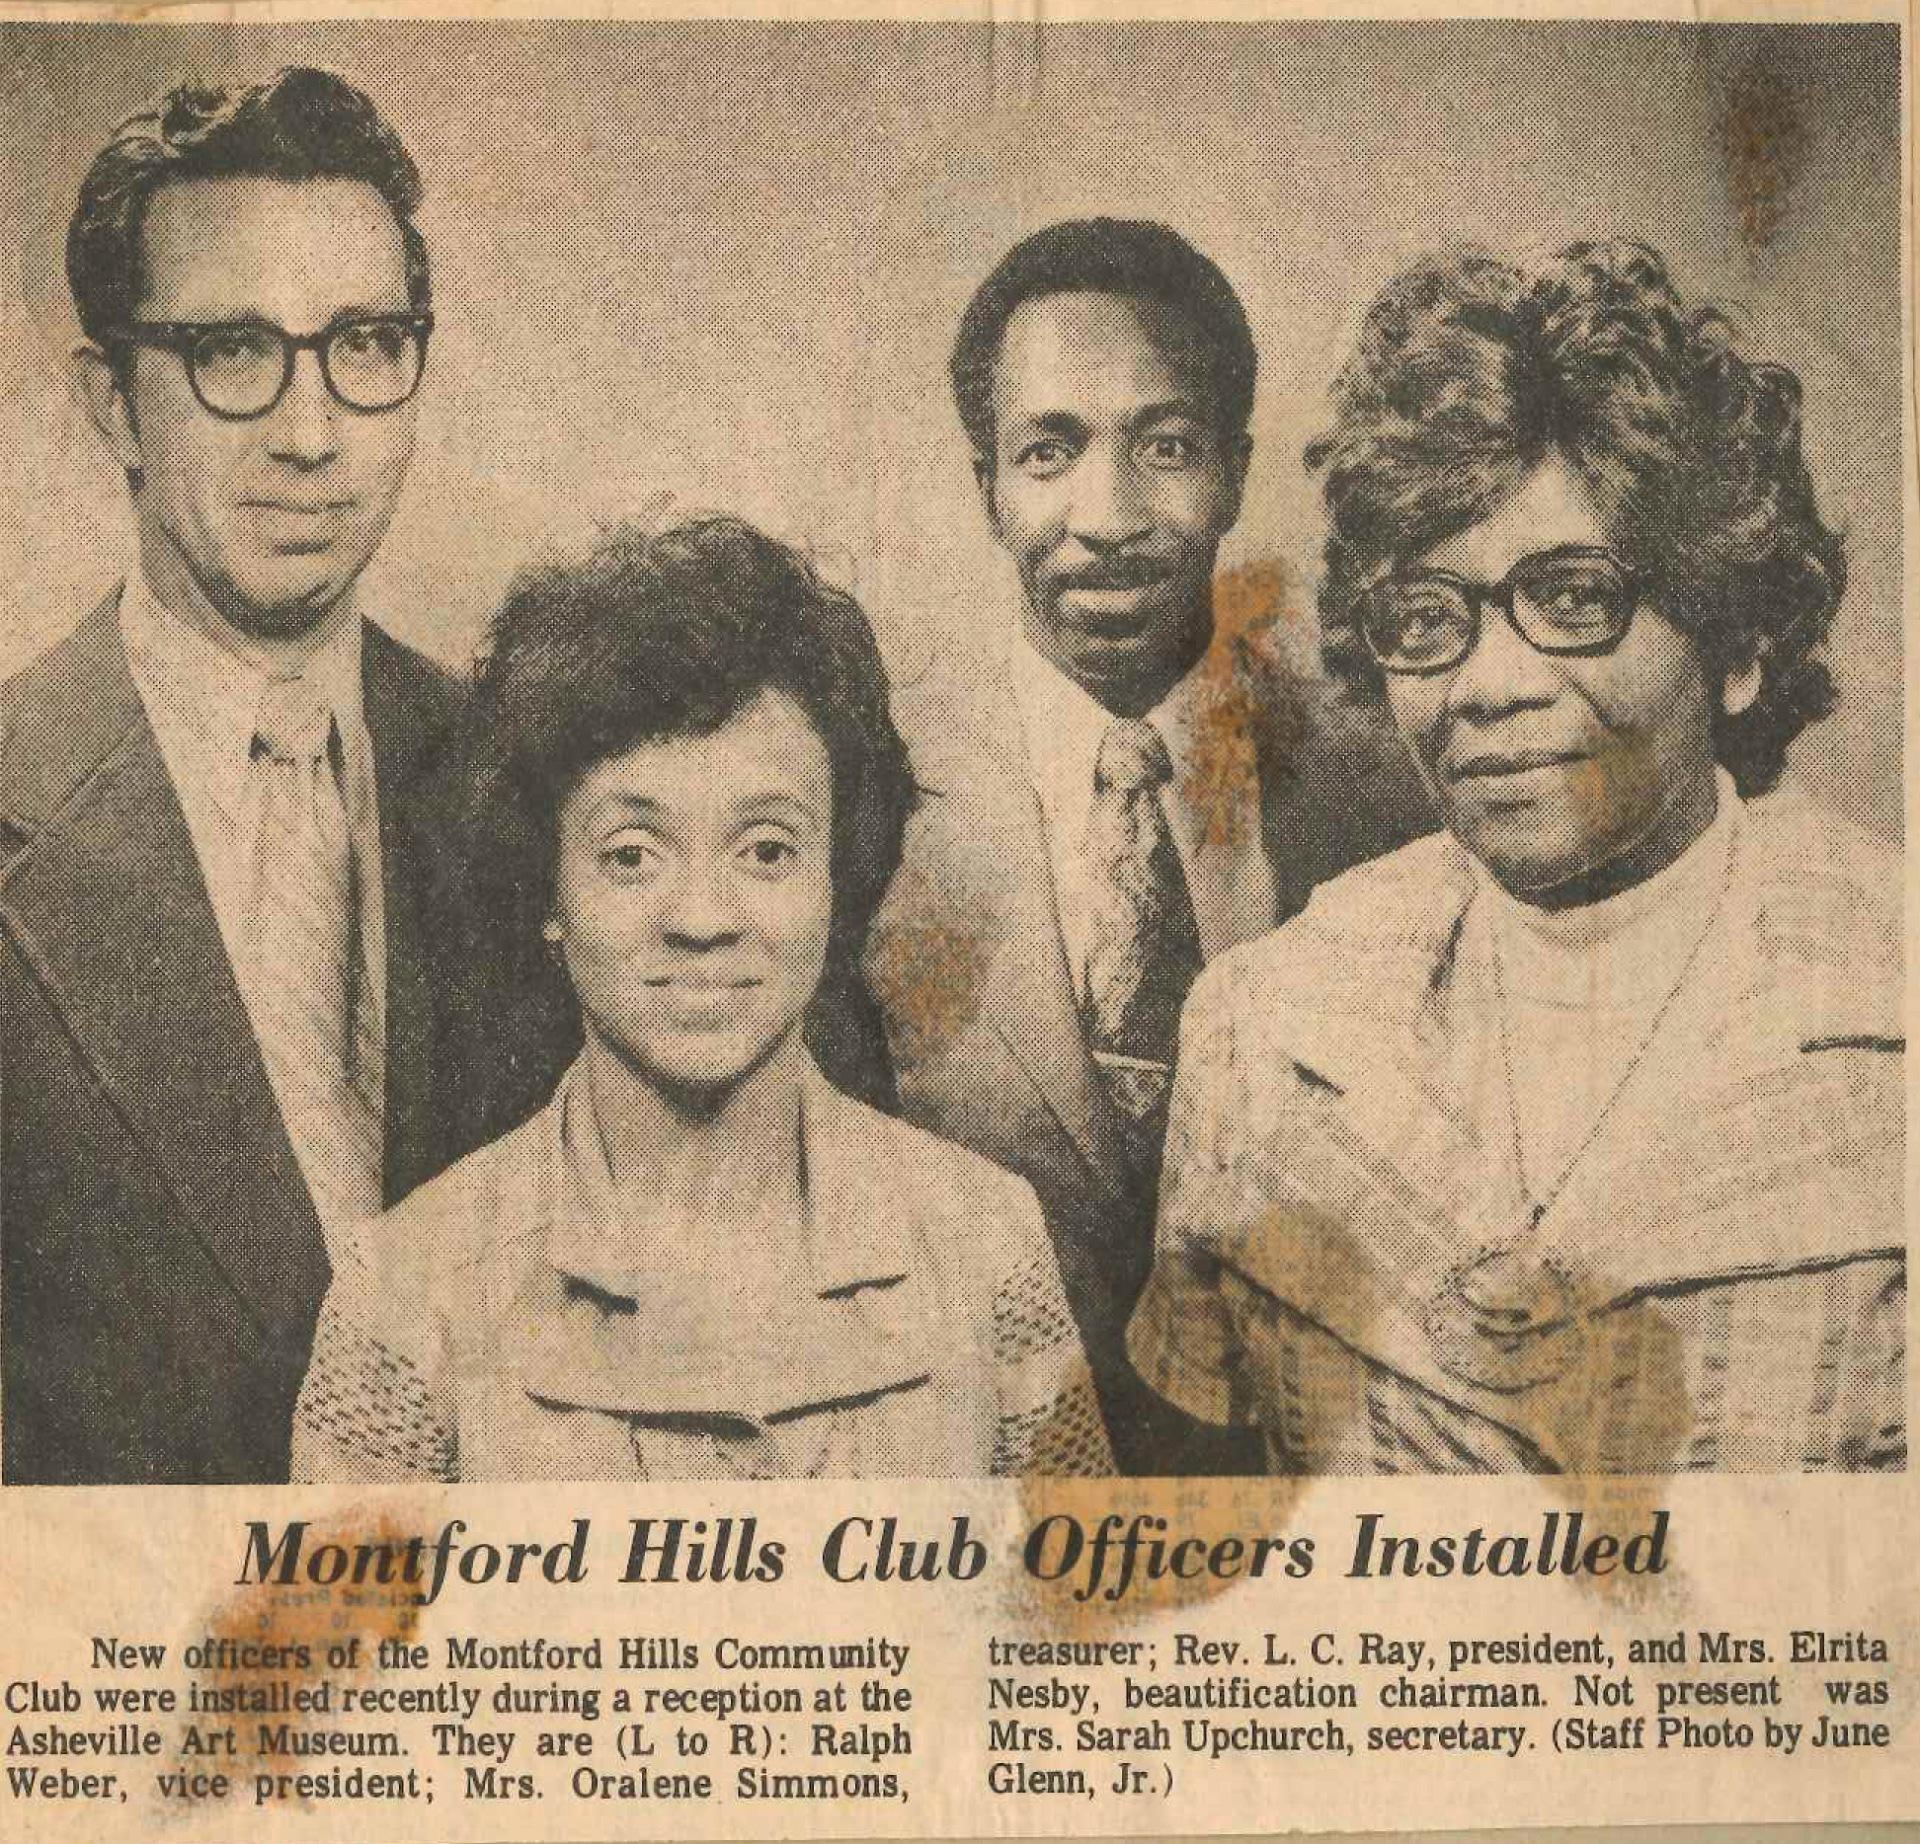 Montford Hills Club Officers 1976